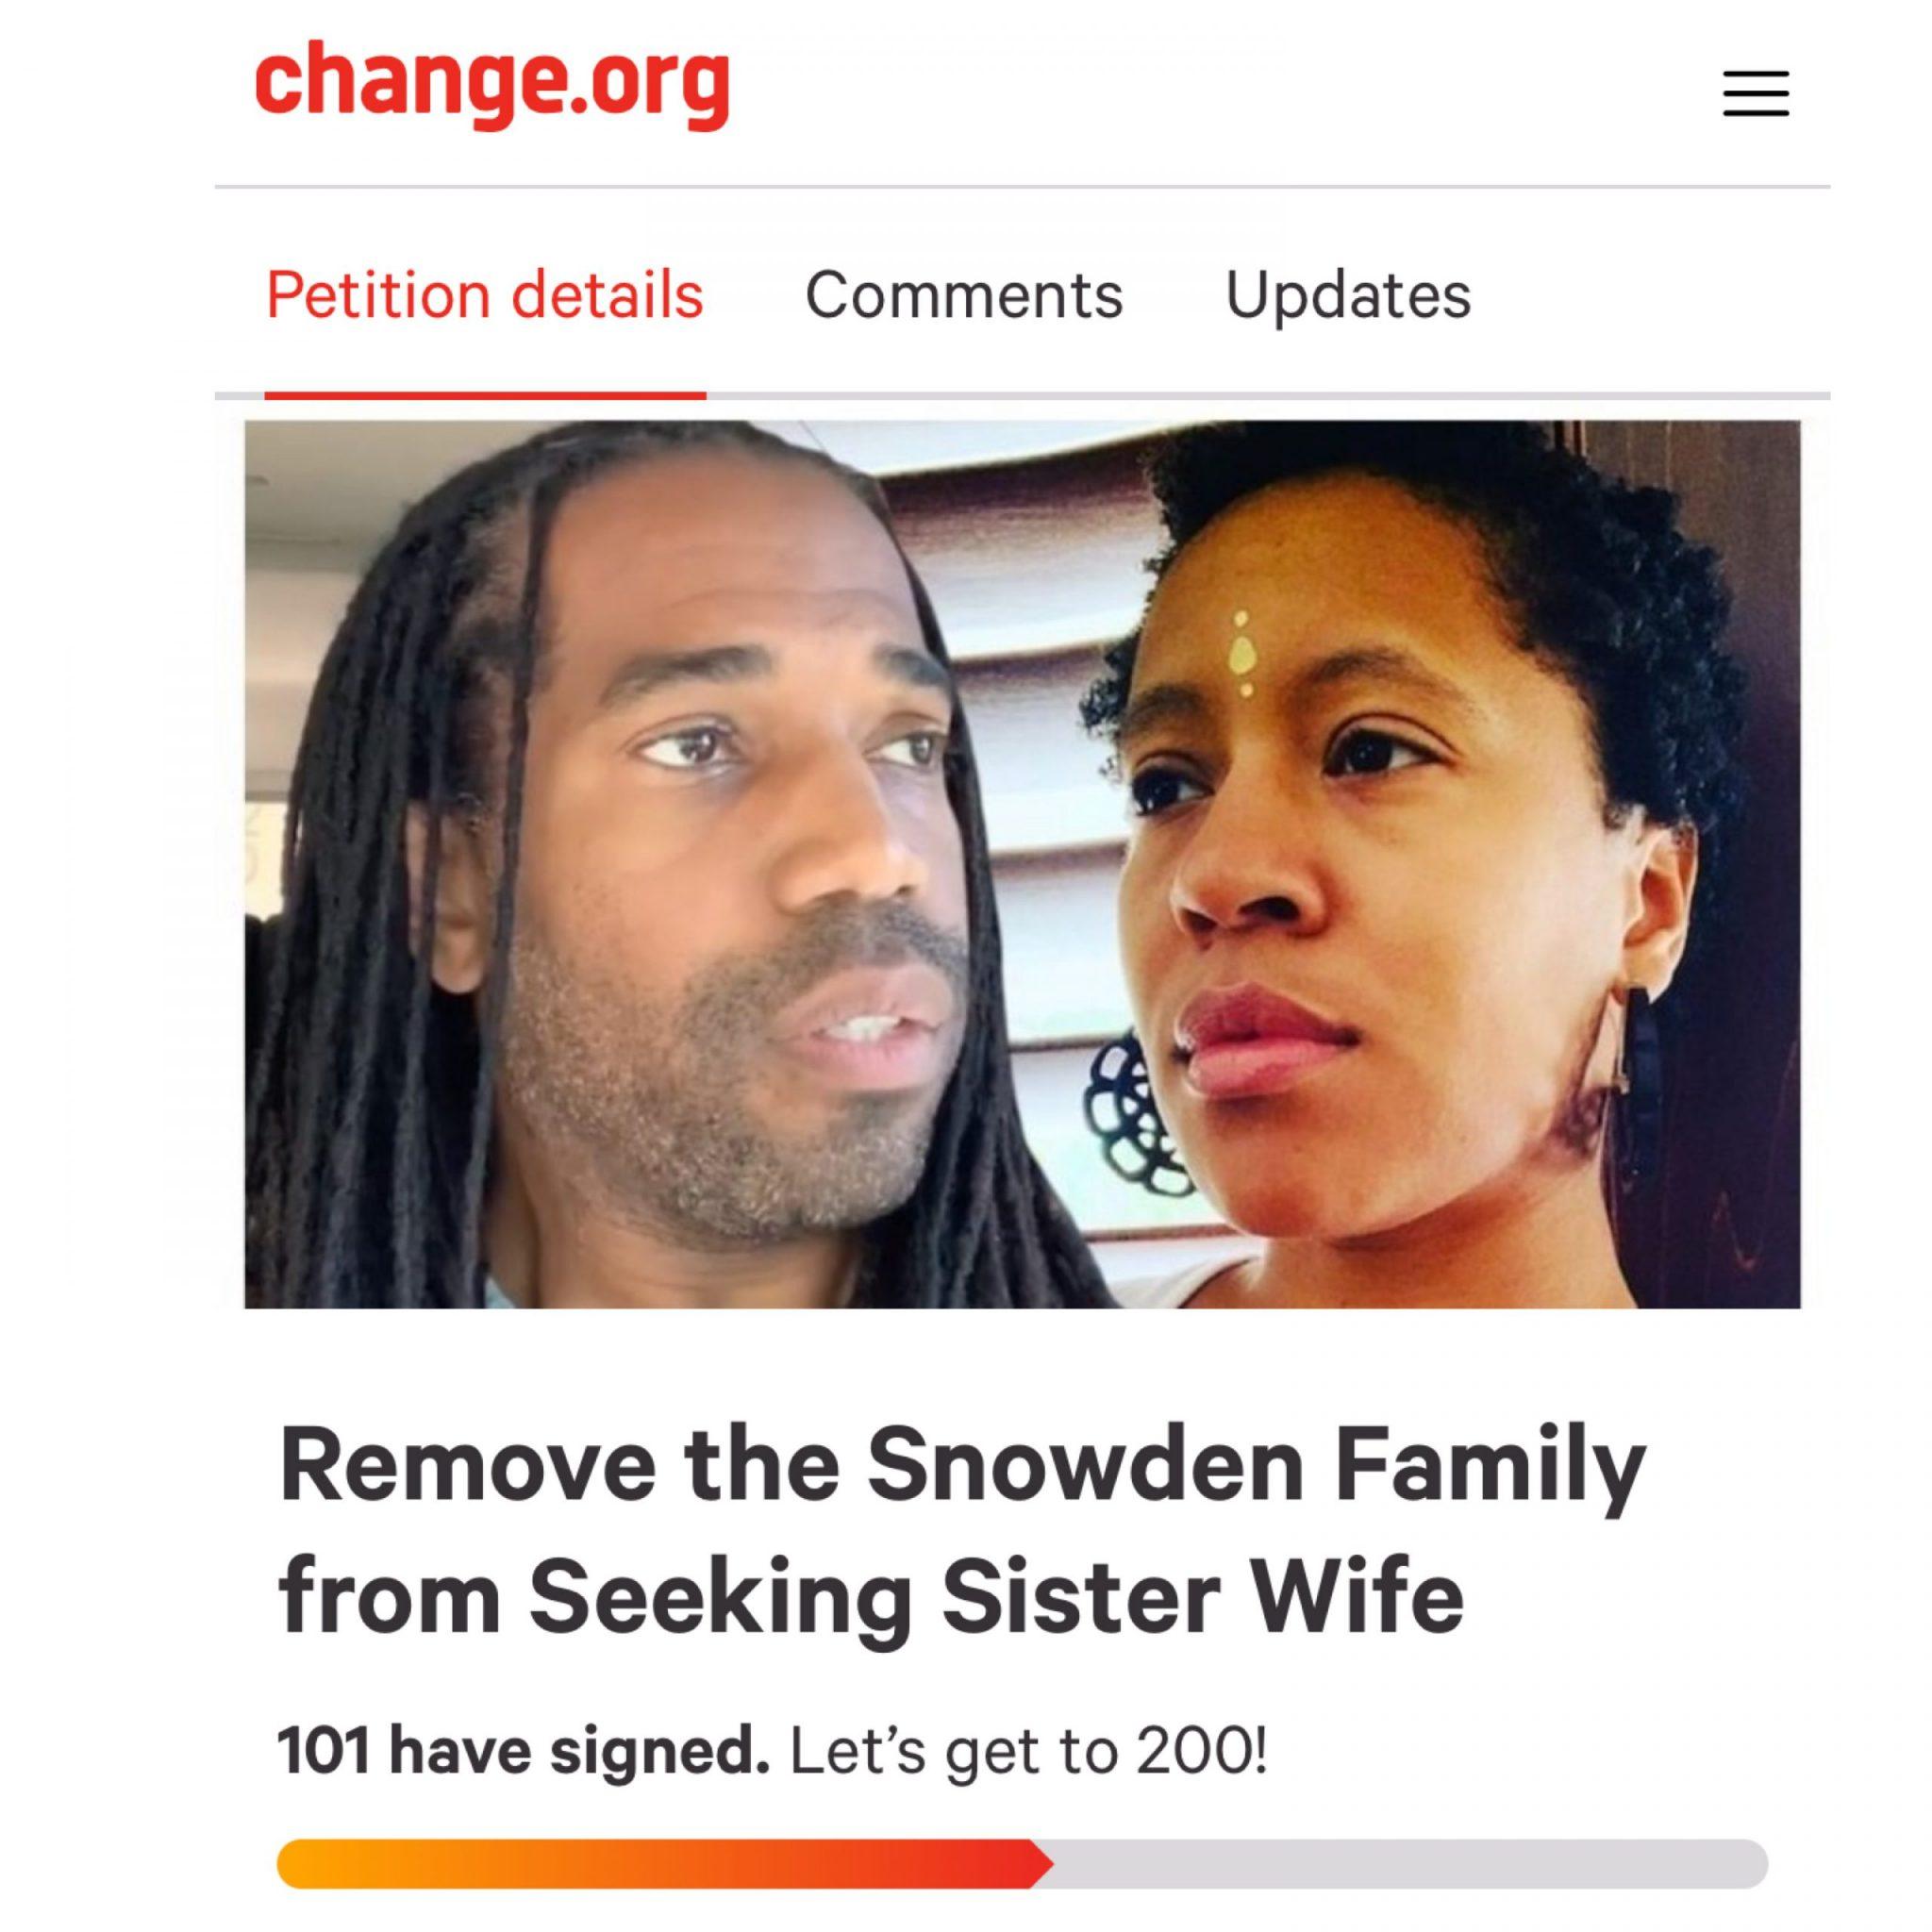 Seeking Sister Wife Credit: change.org